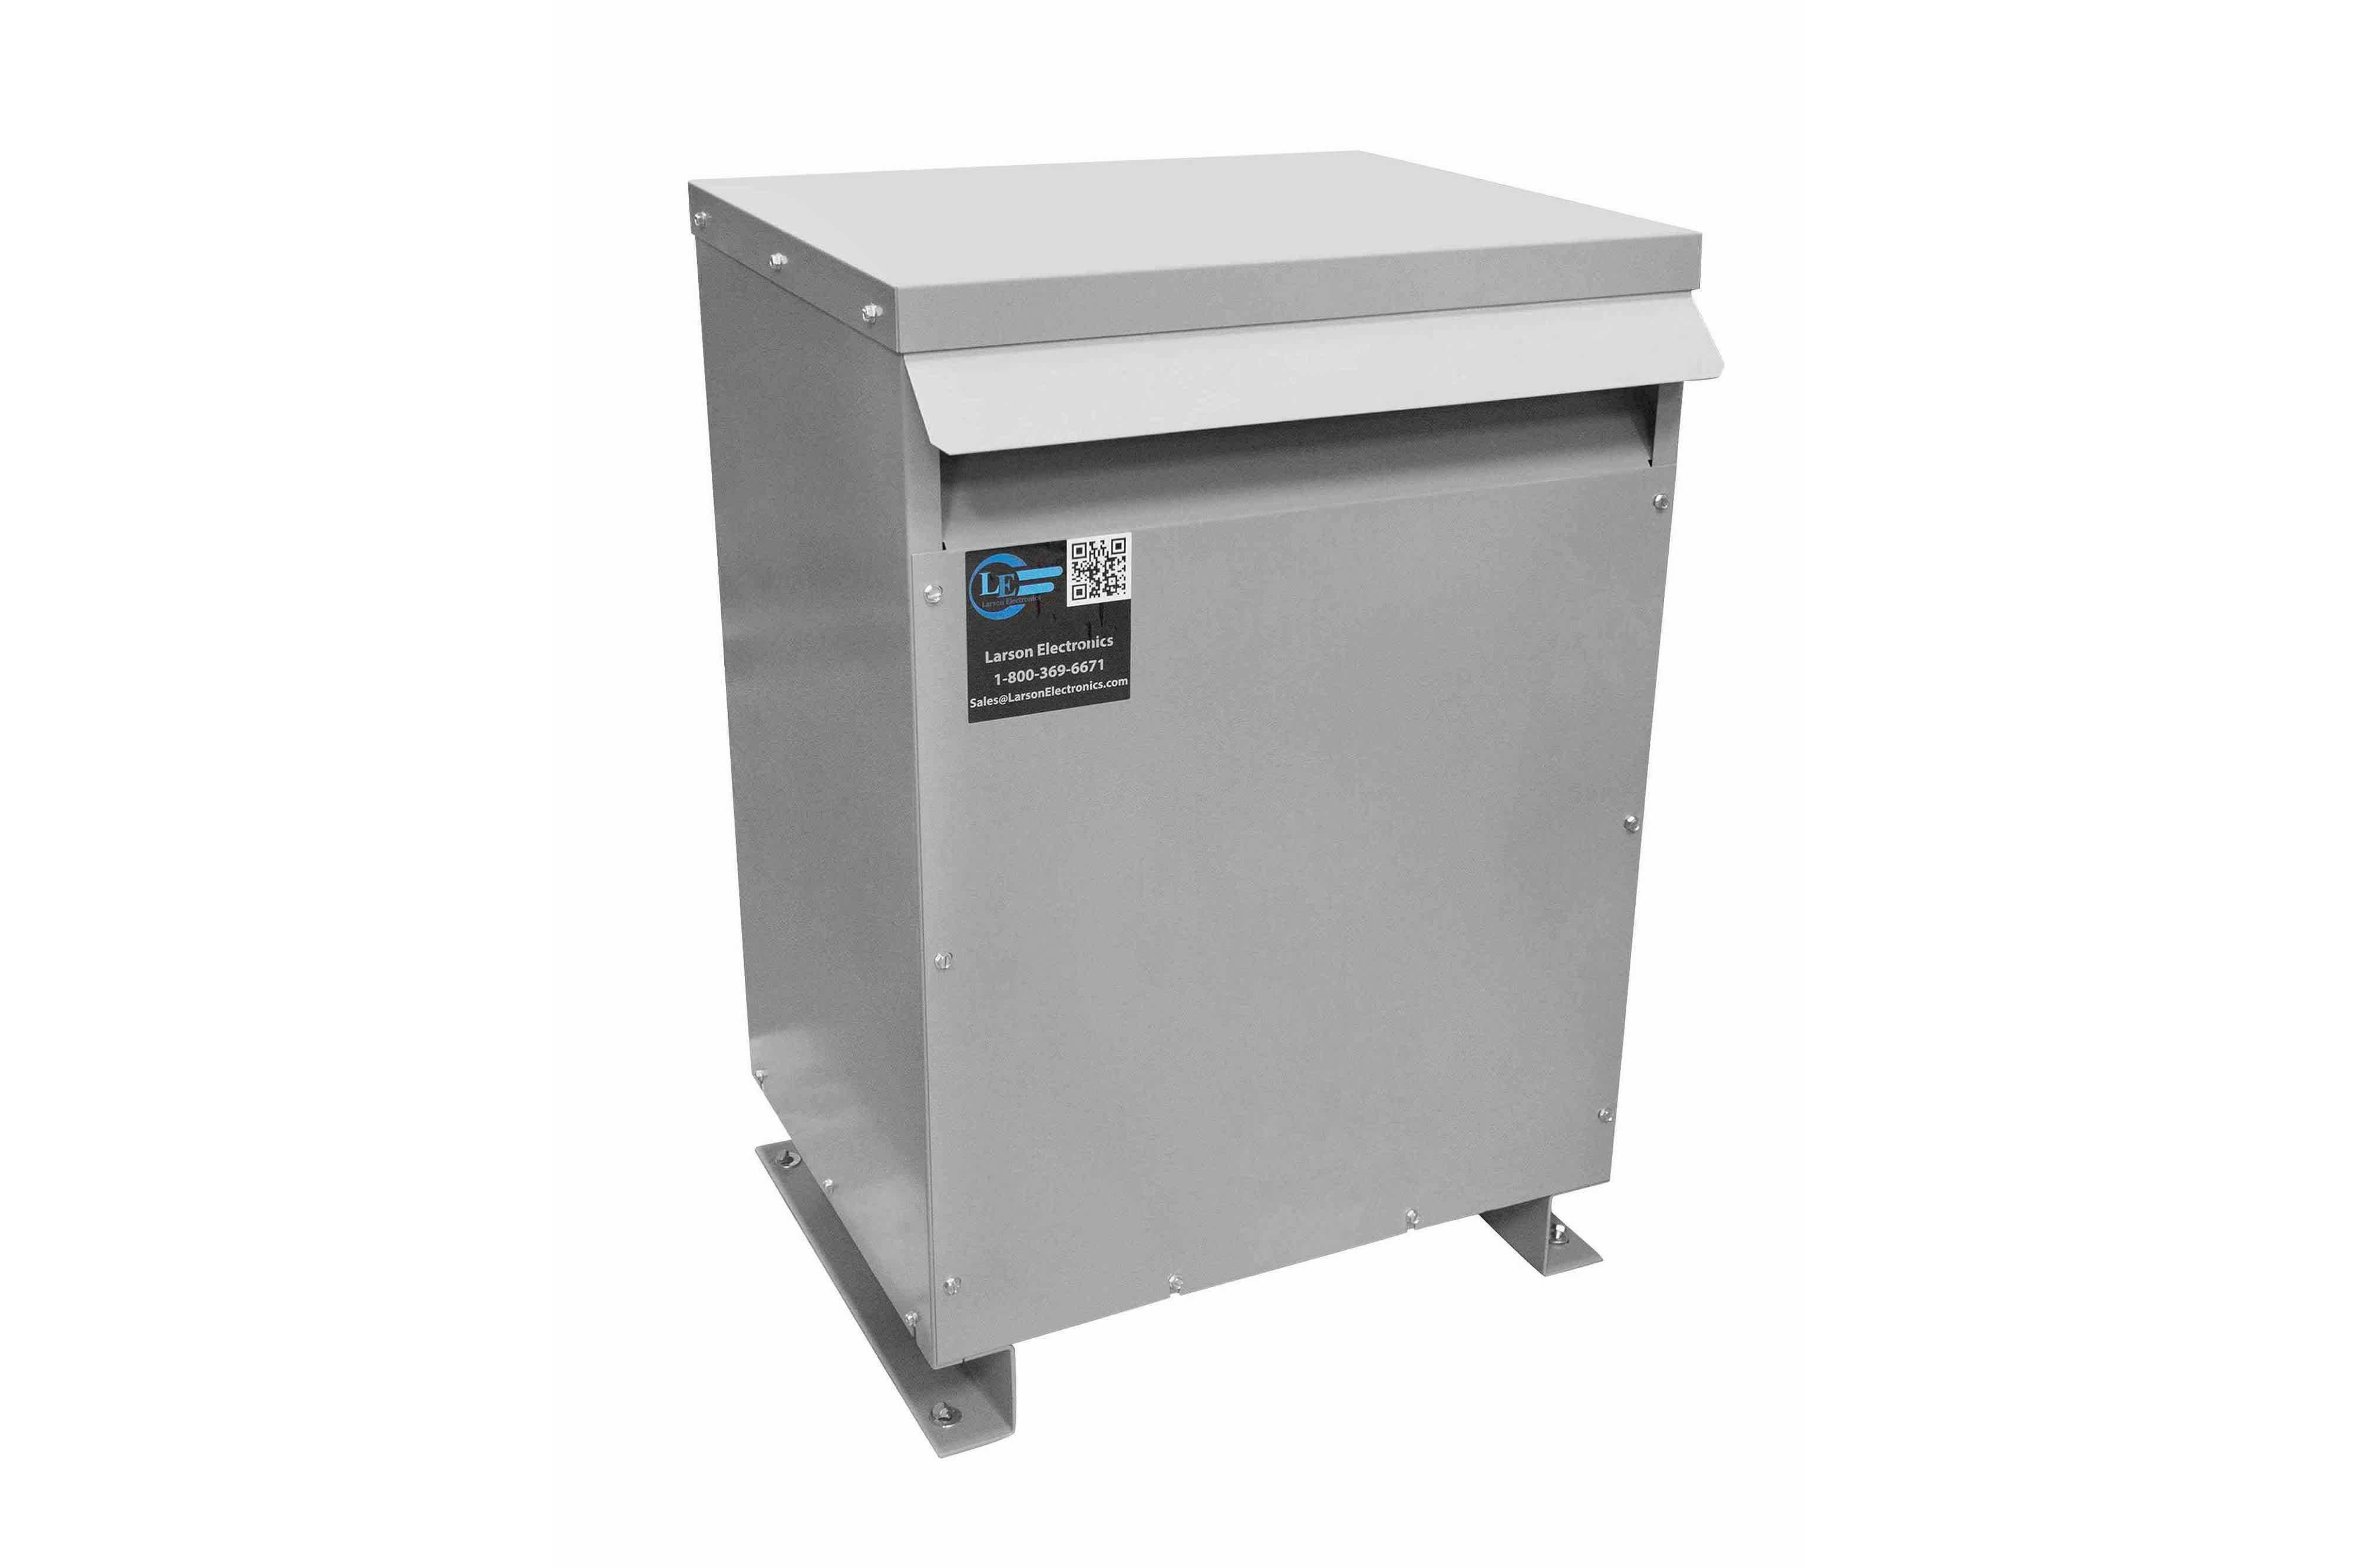 167 kVA 3PH Isolation Transformer, 460V Wye Primary, 575V Delta Secondary, N3R, Ventilated, 60 Hz